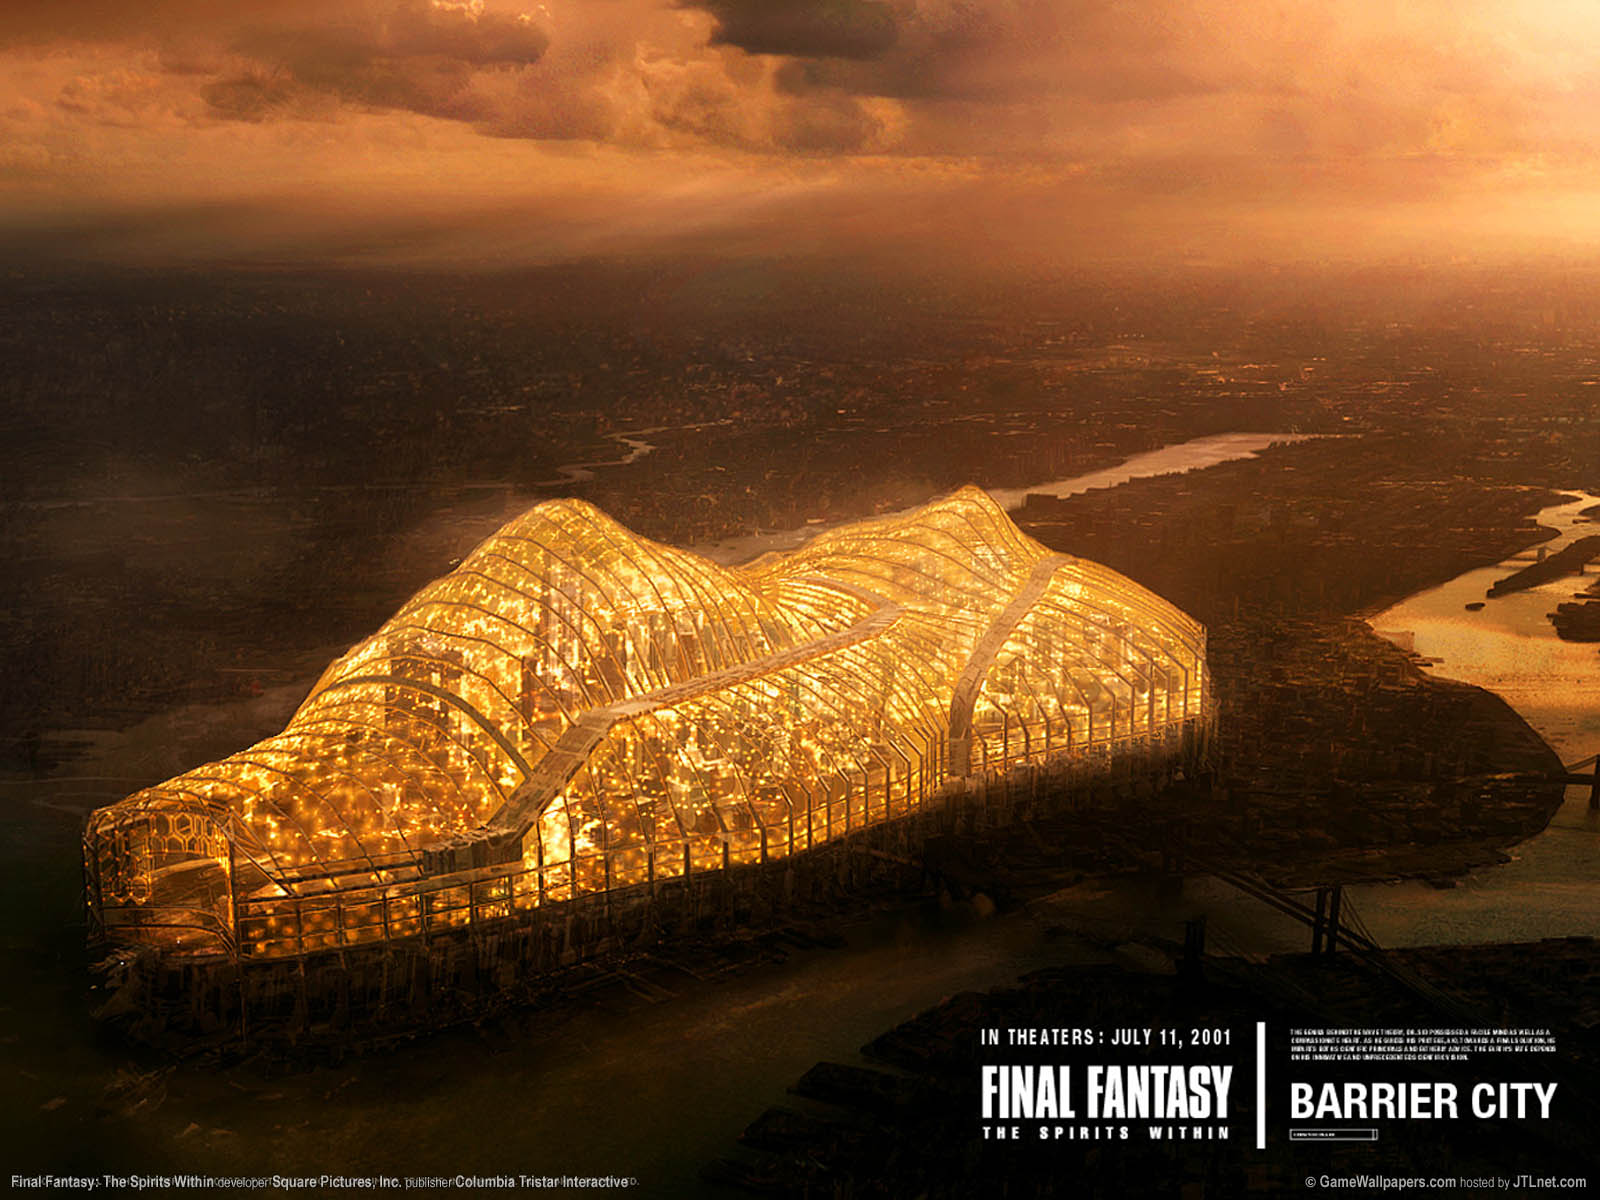 Final Fantasy: The Spirits Within achtergrond 04 1600x1200